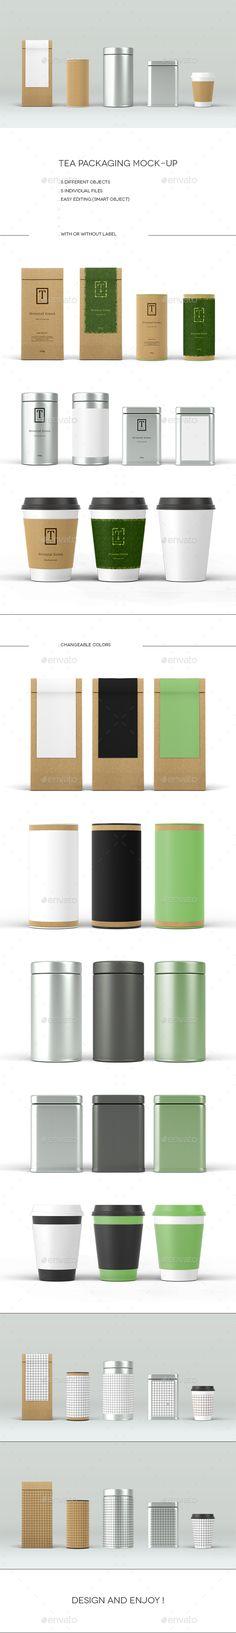 Tea Packaging Mock-Up #design Download: http://graphicriver.net/item/tea-packaging-mockup/14187464?ref=ksioks